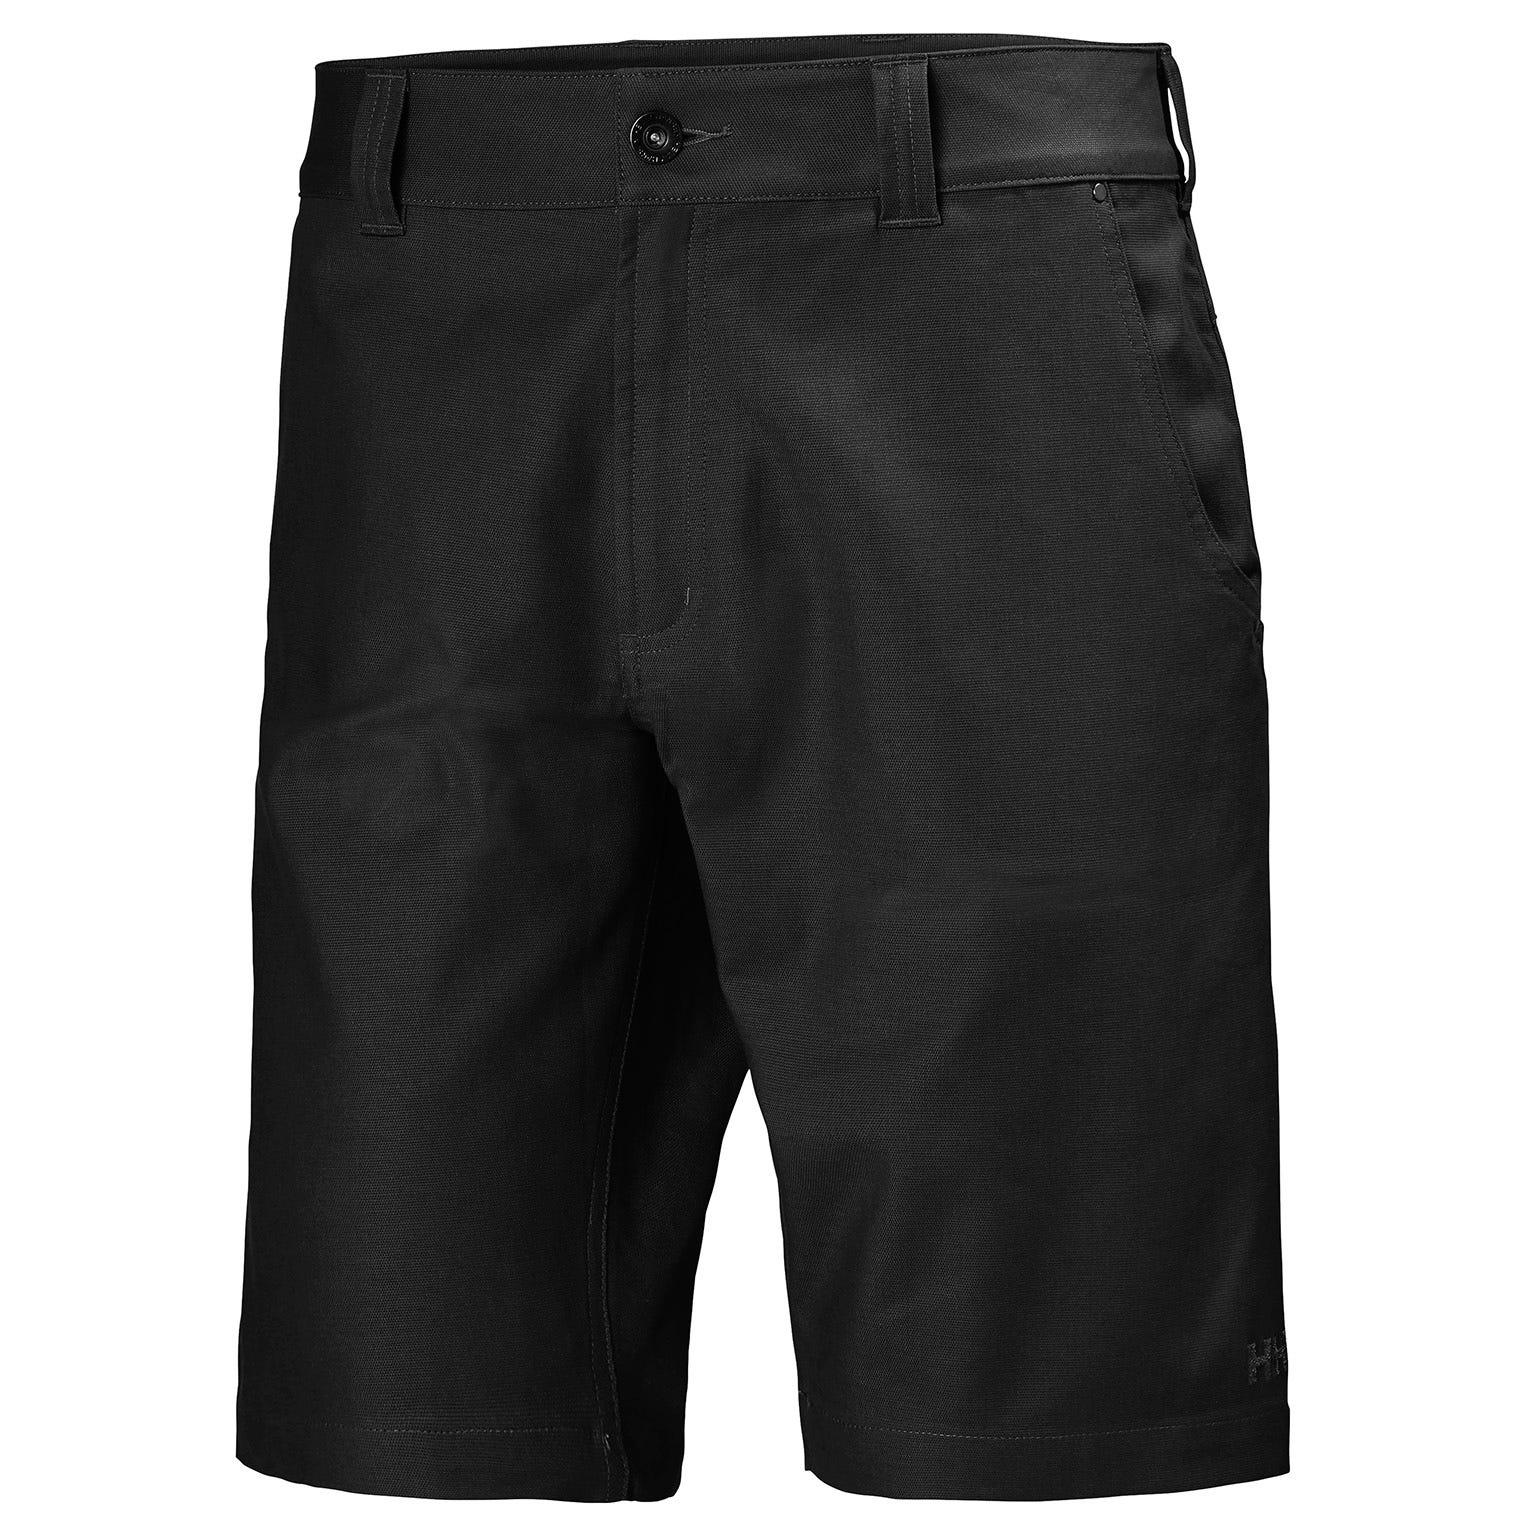 Mens Essential Canvas 5-pocket Hiking Shorts | Uk Helly Hansen Mens Trouser Black L